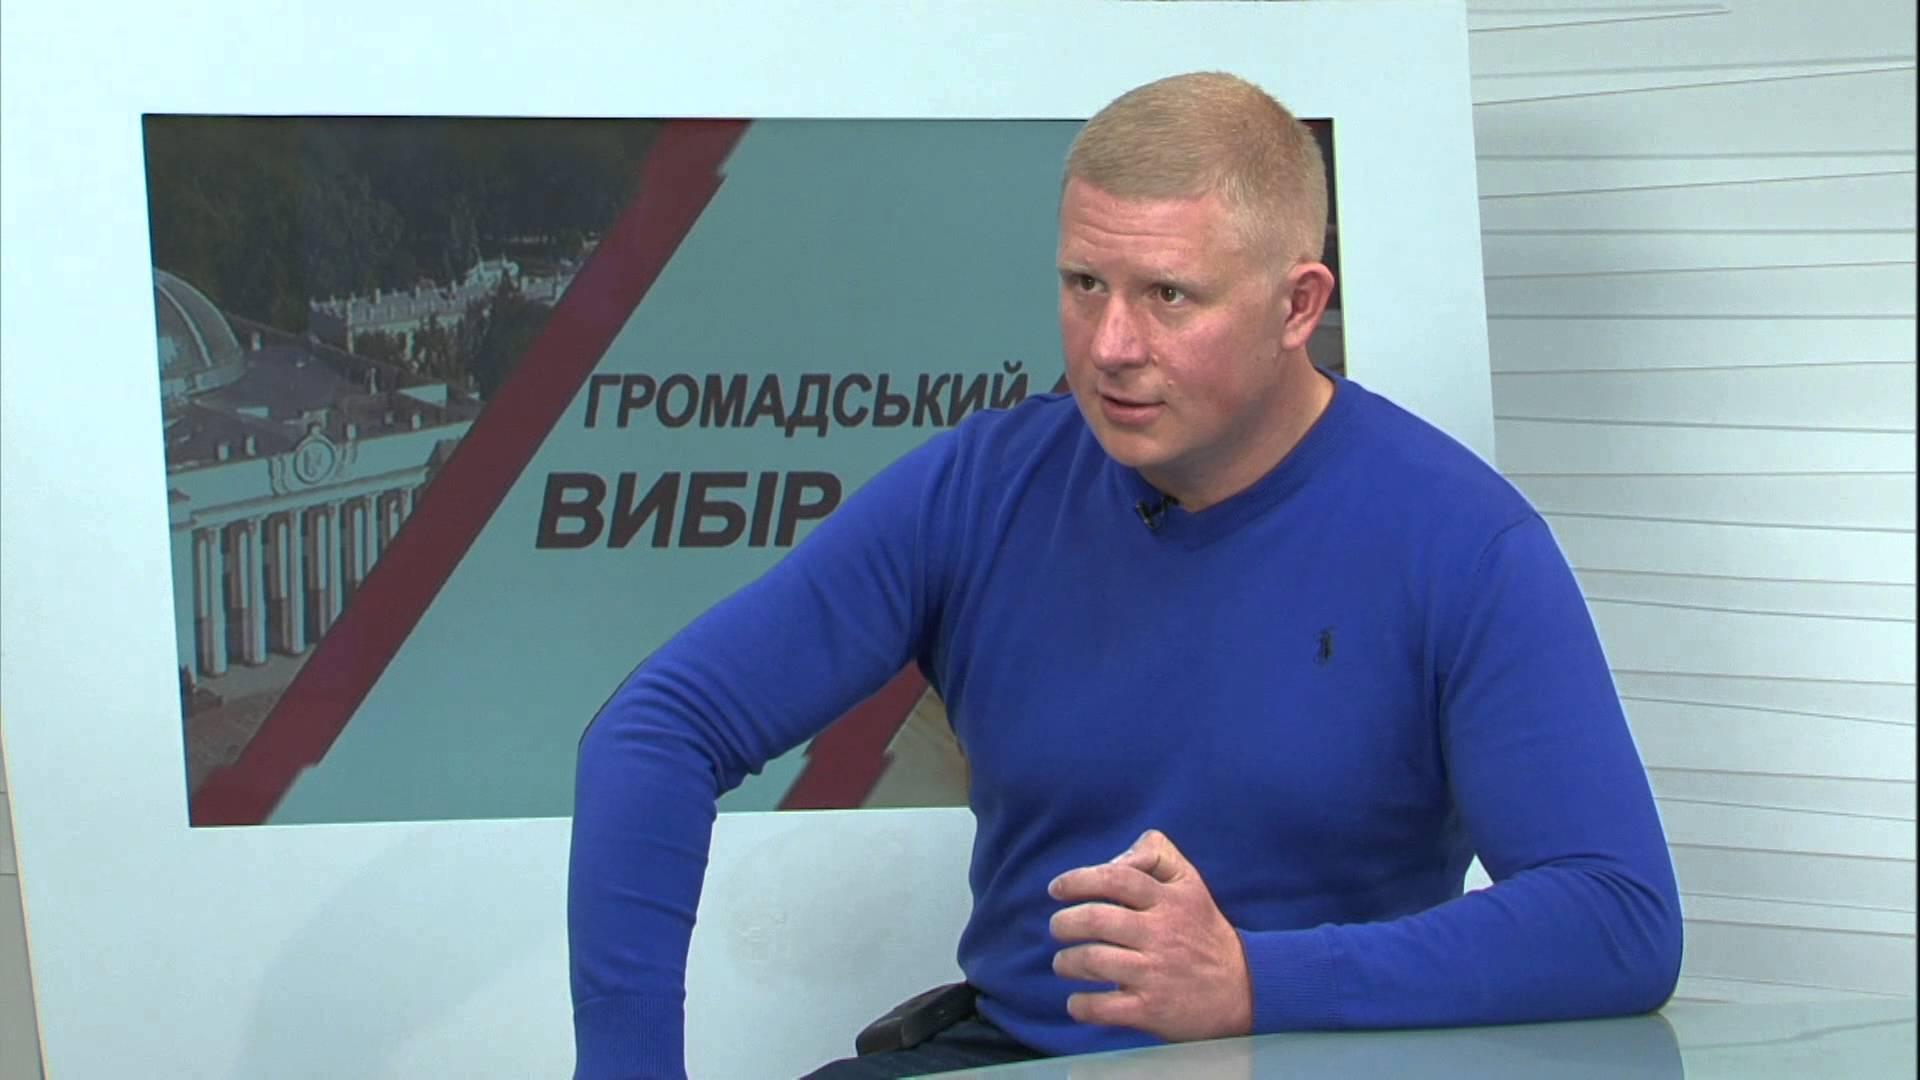 Запорожского активиста и соратника Саакашвили подозревают в сотрудничестве с российскими спецслужбами - ФОТО